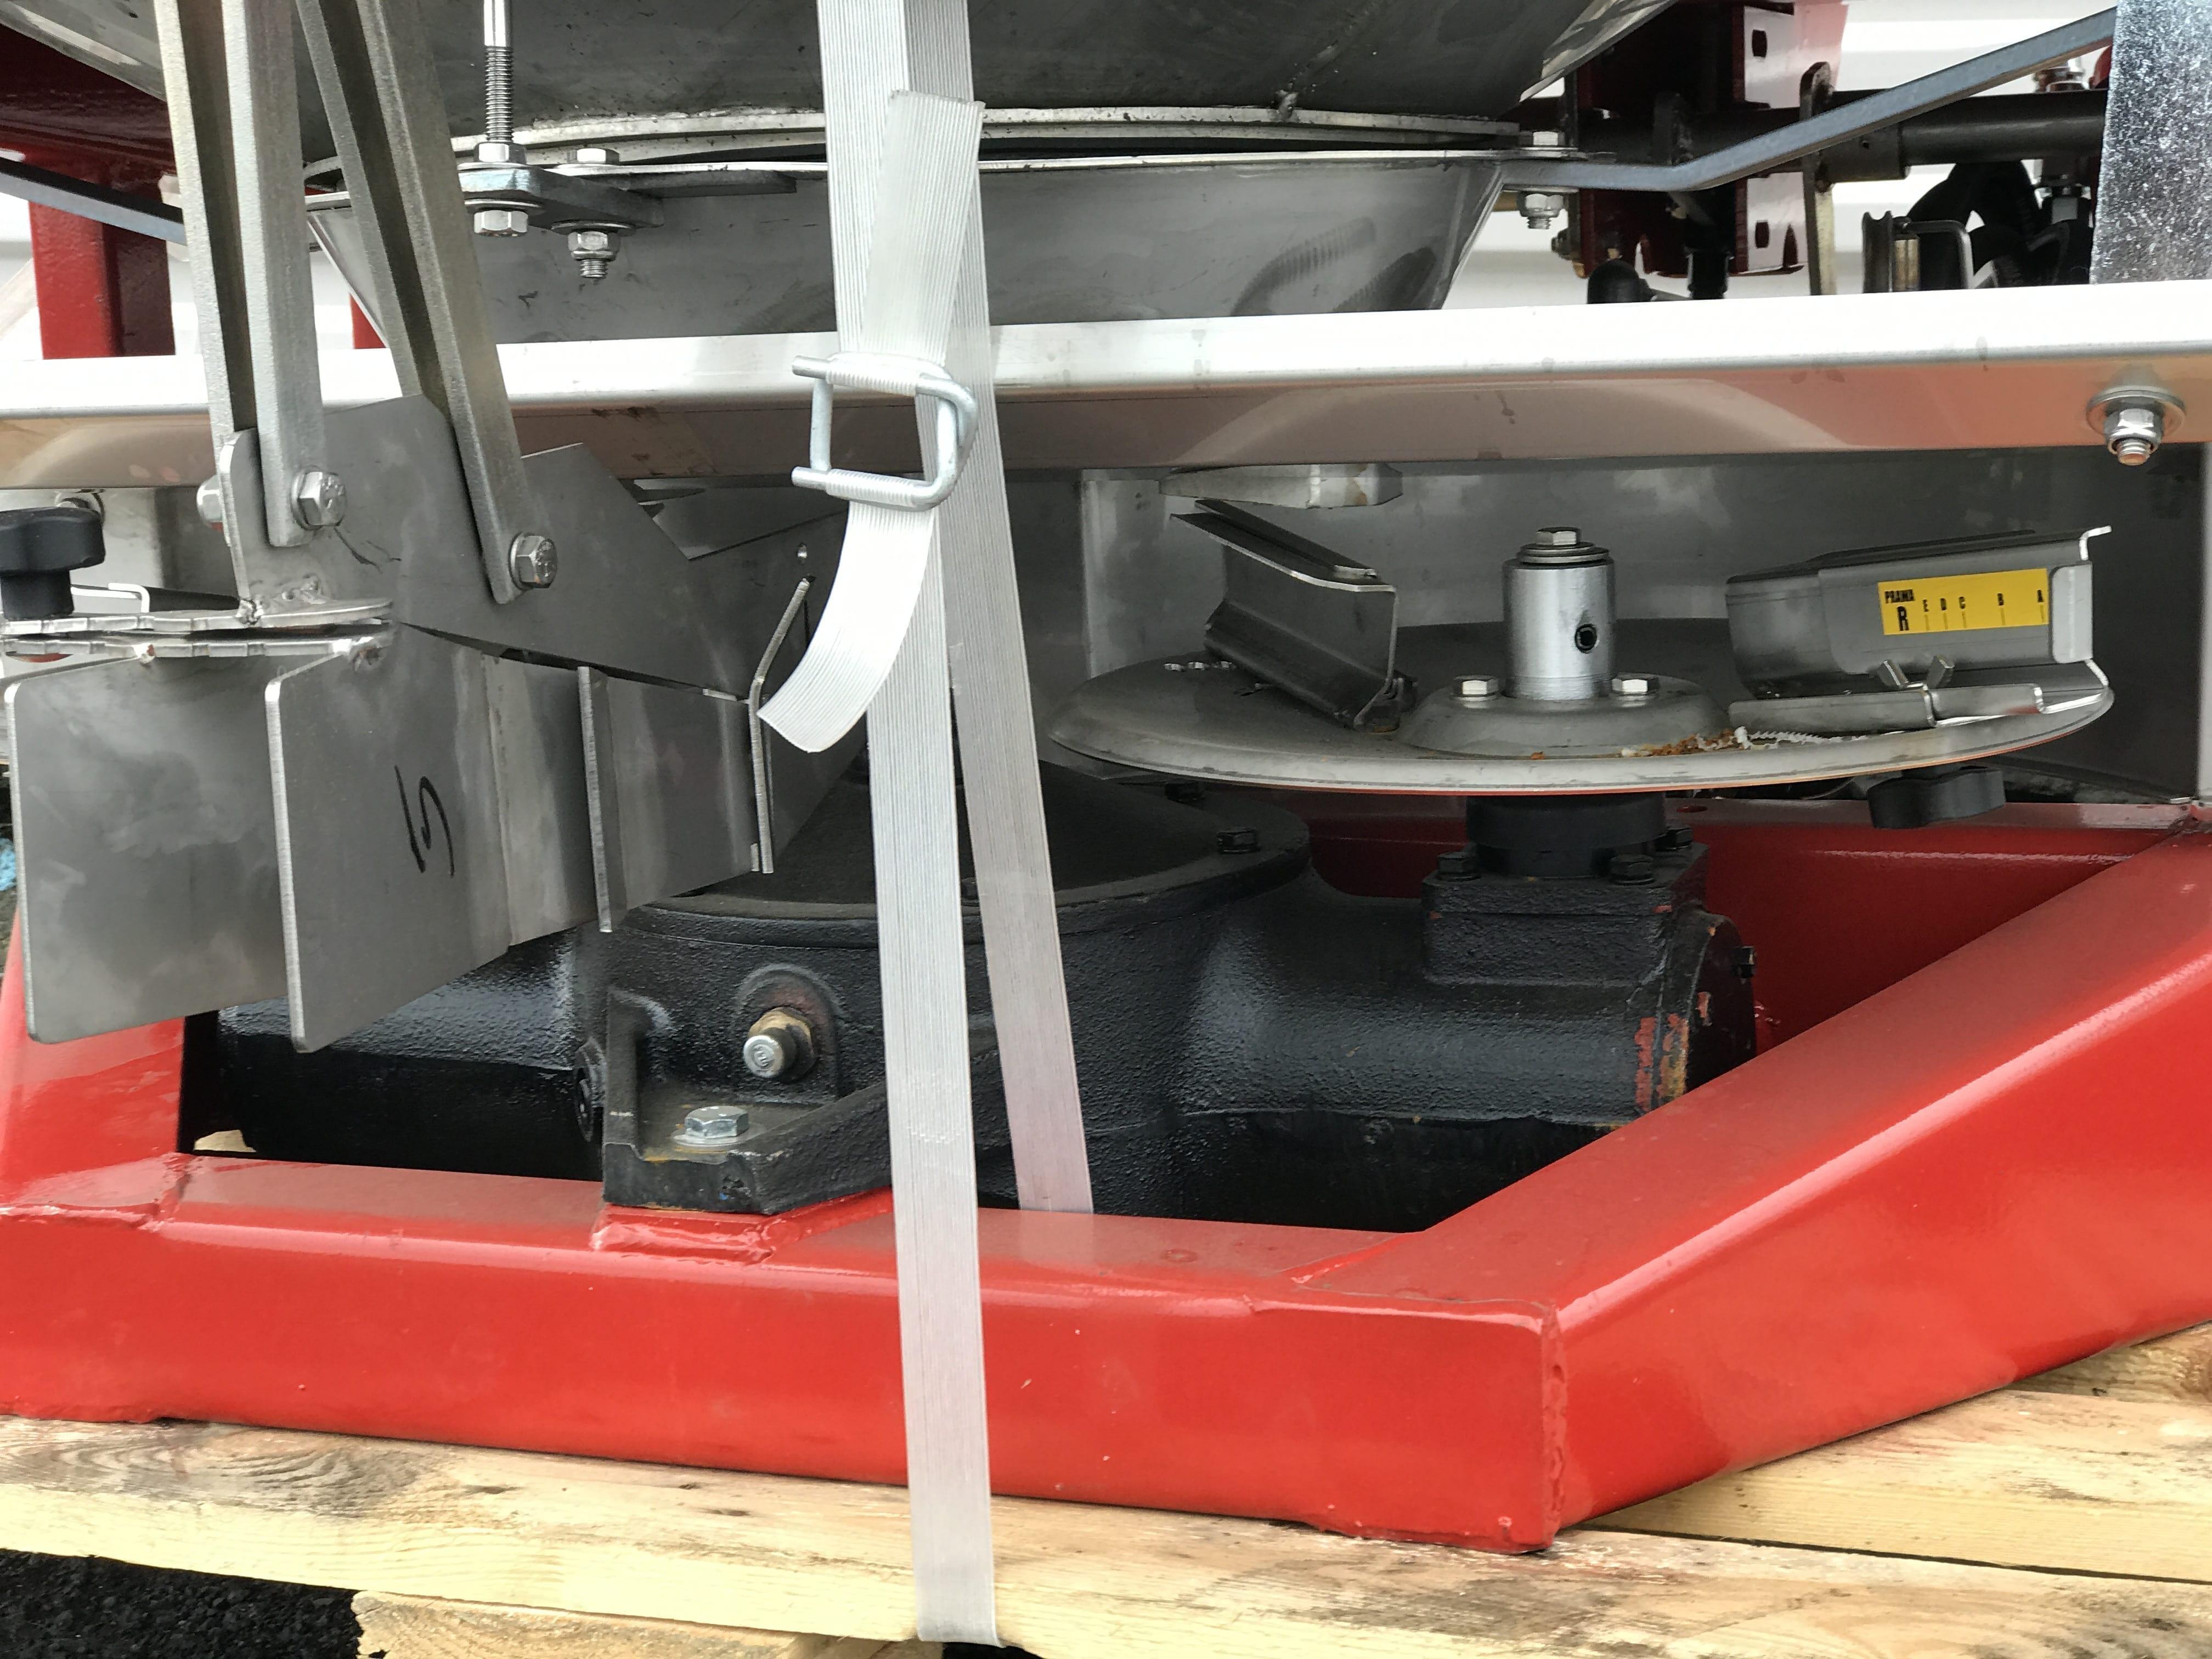 2ja diska dreifari SR 2000 kg